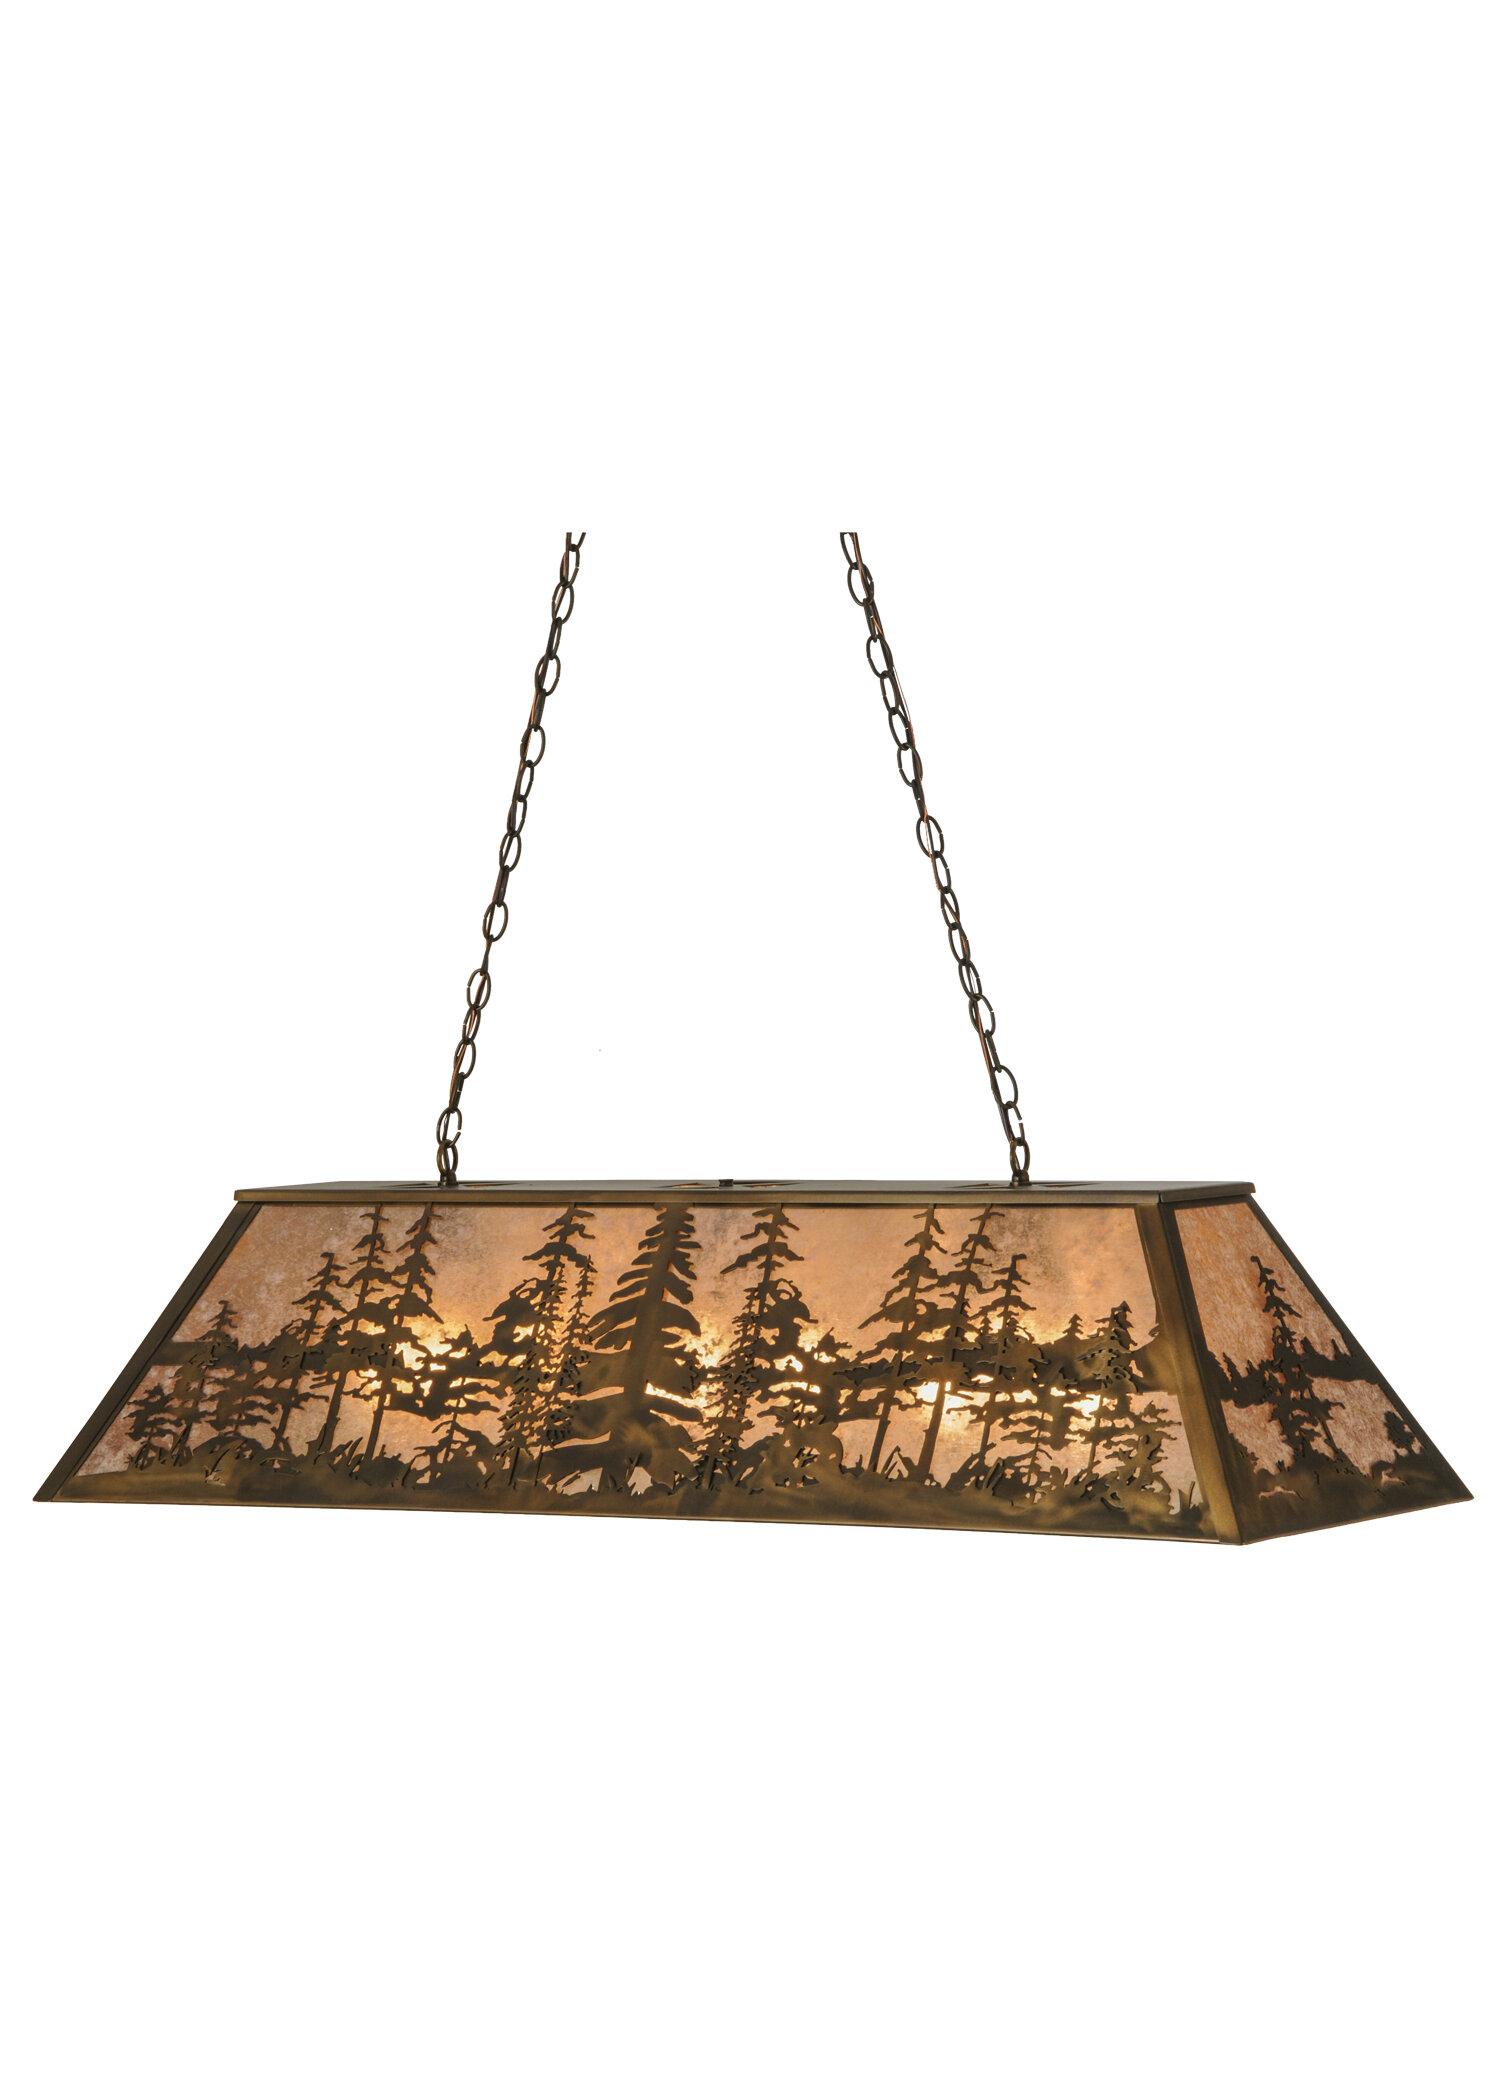 Meyda Tiffany Tall Pines Light Pool Table Pendant Wayfair - How tall is a pool table